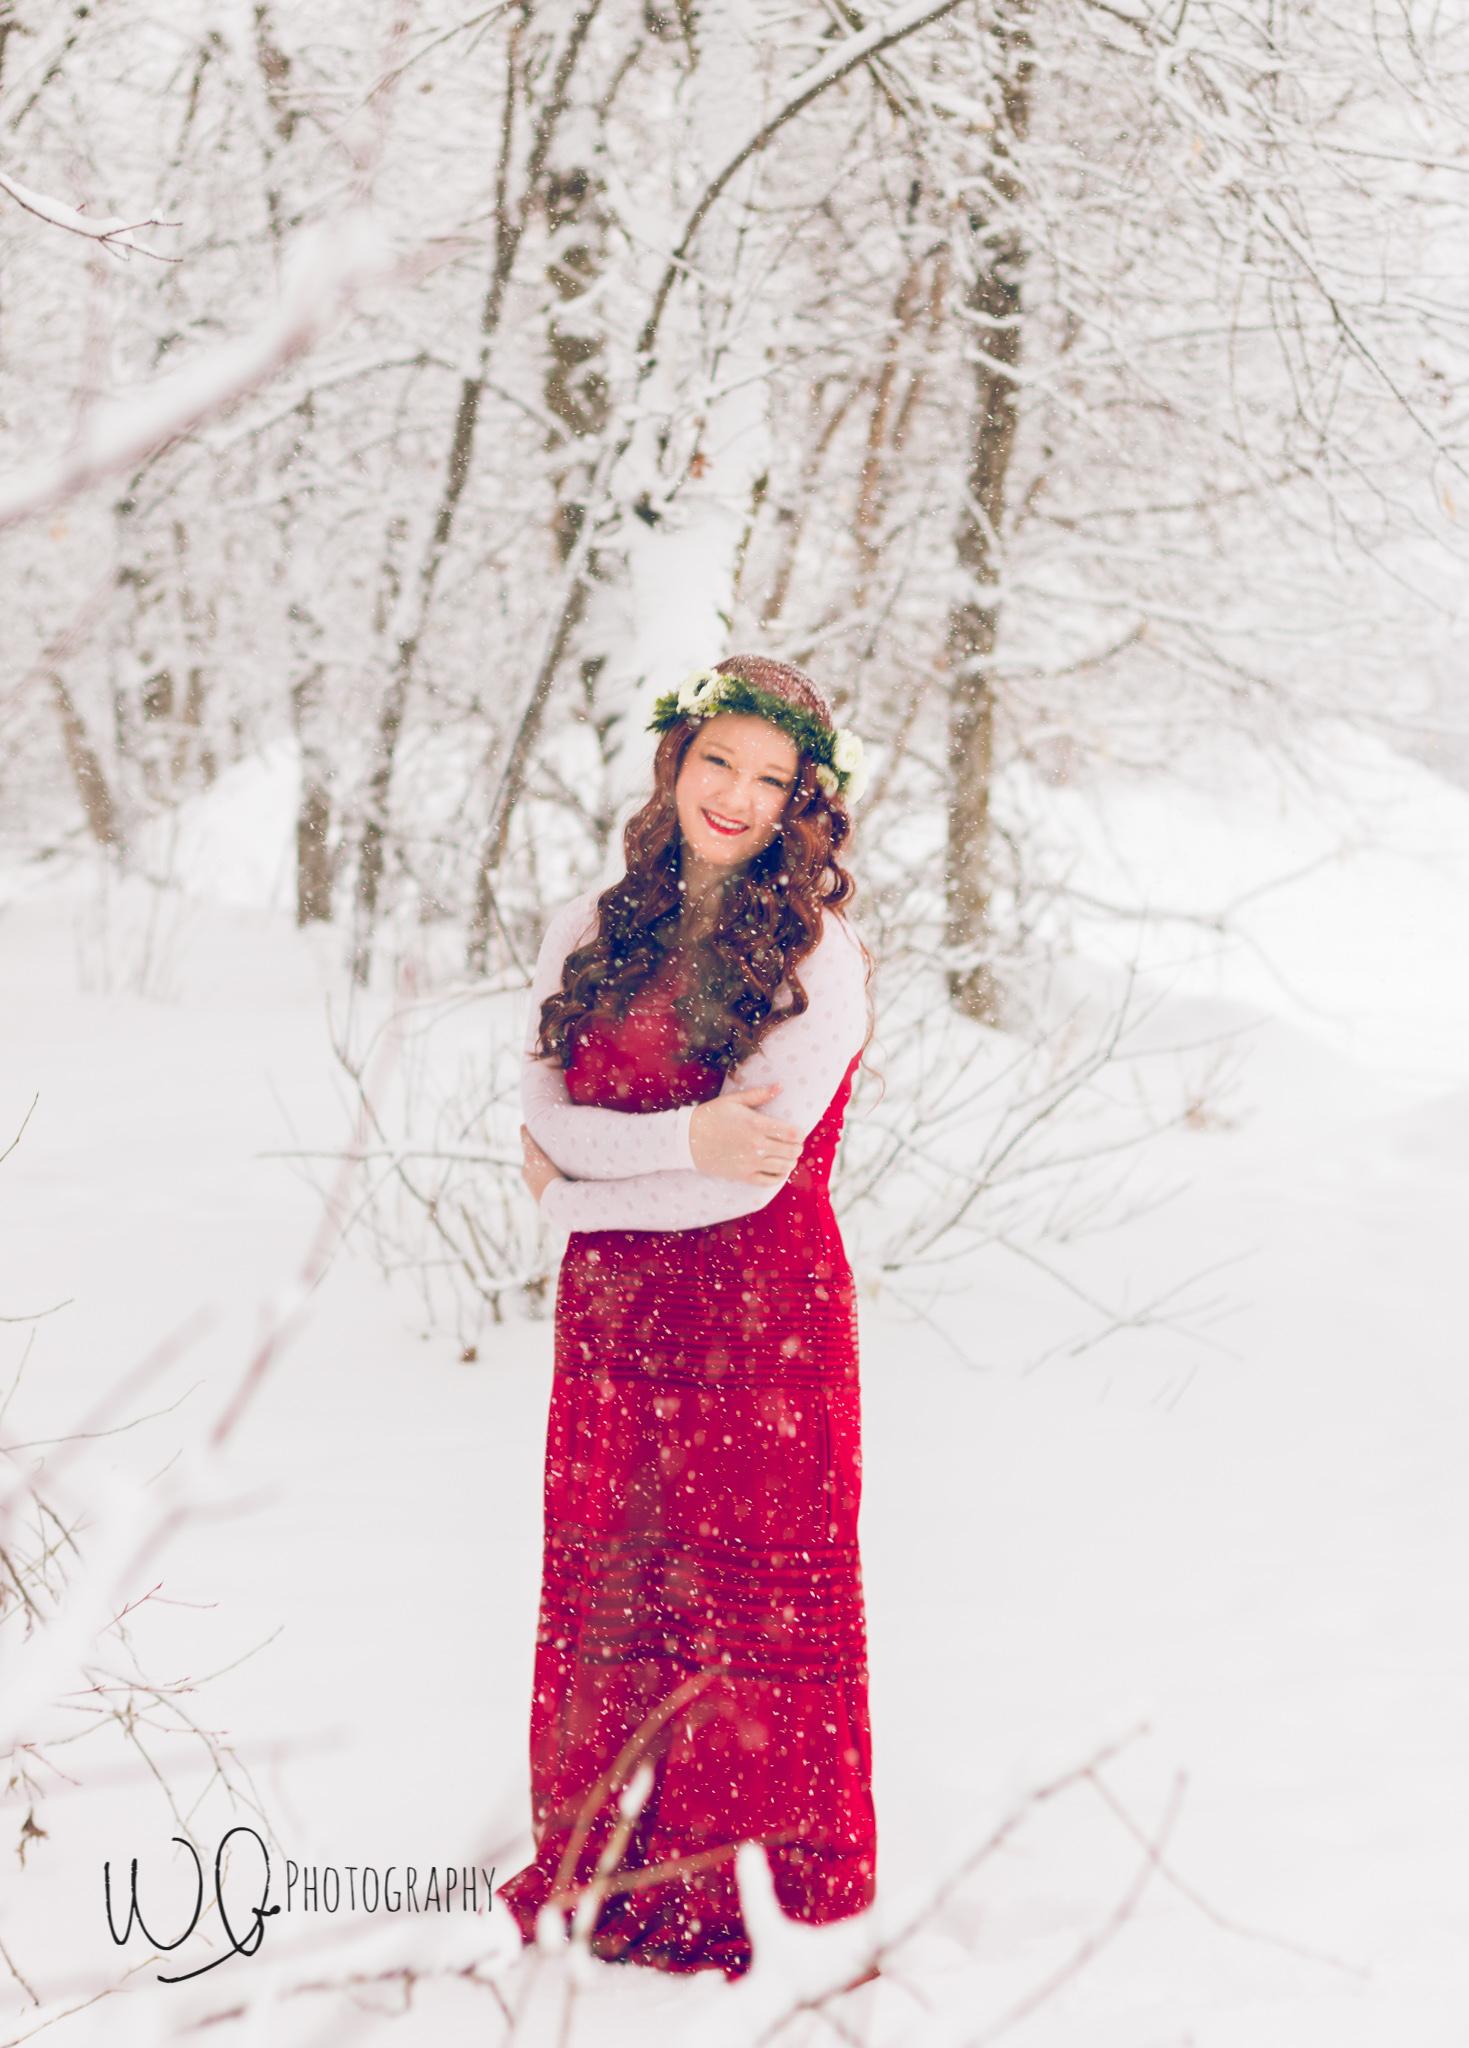 Senior pictures, winter photo shoot, flower crown photo shoot